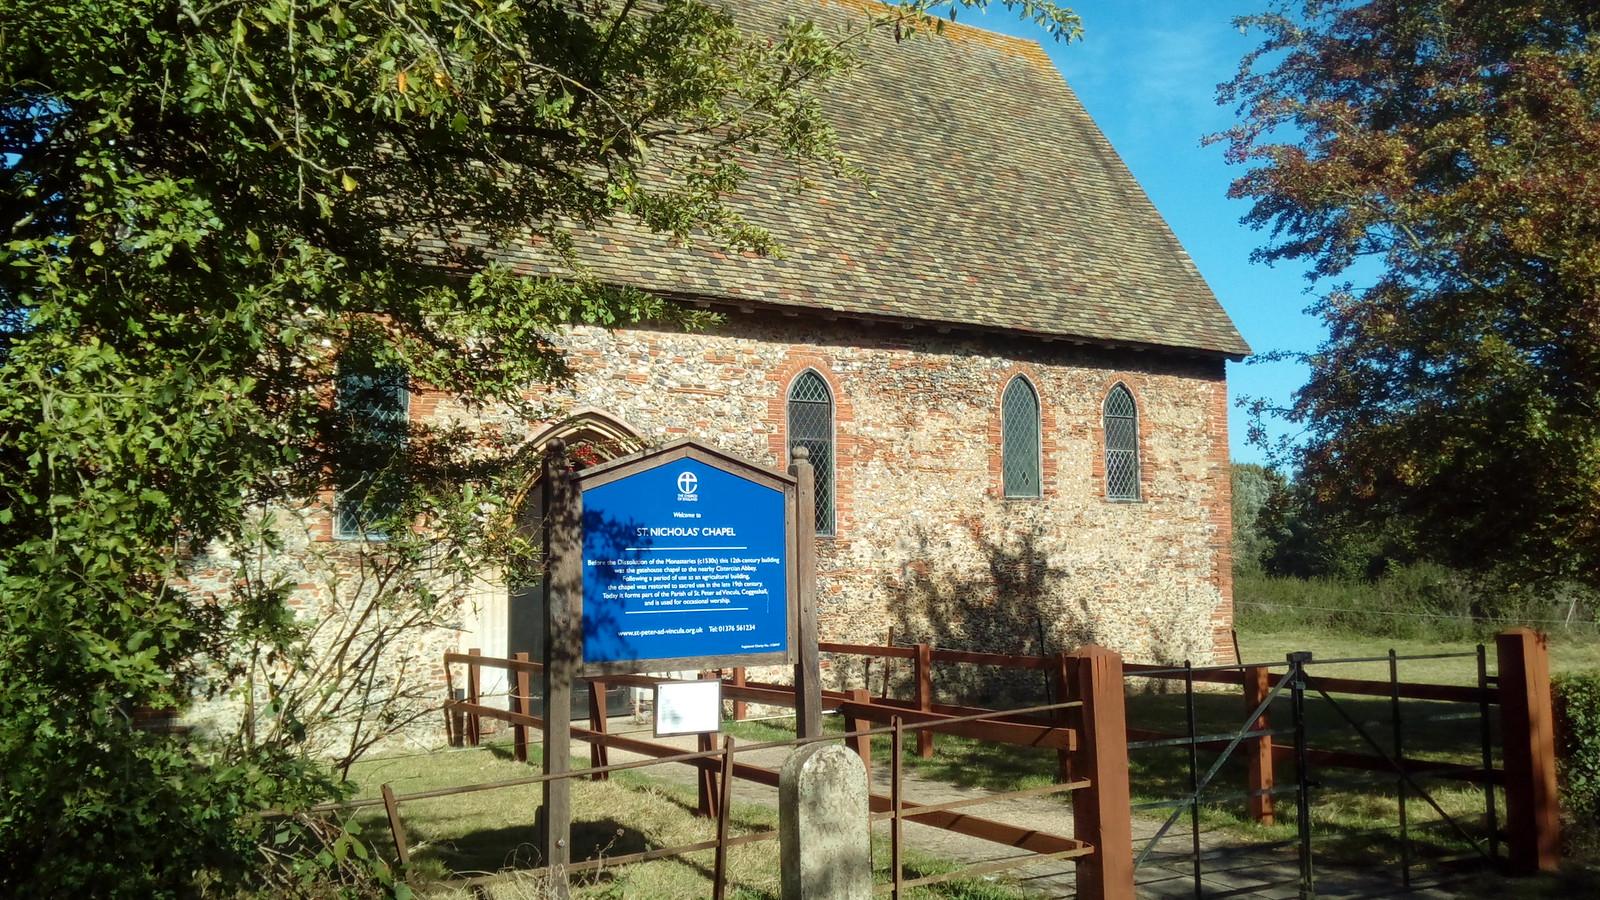 St. Nicholas Chapel